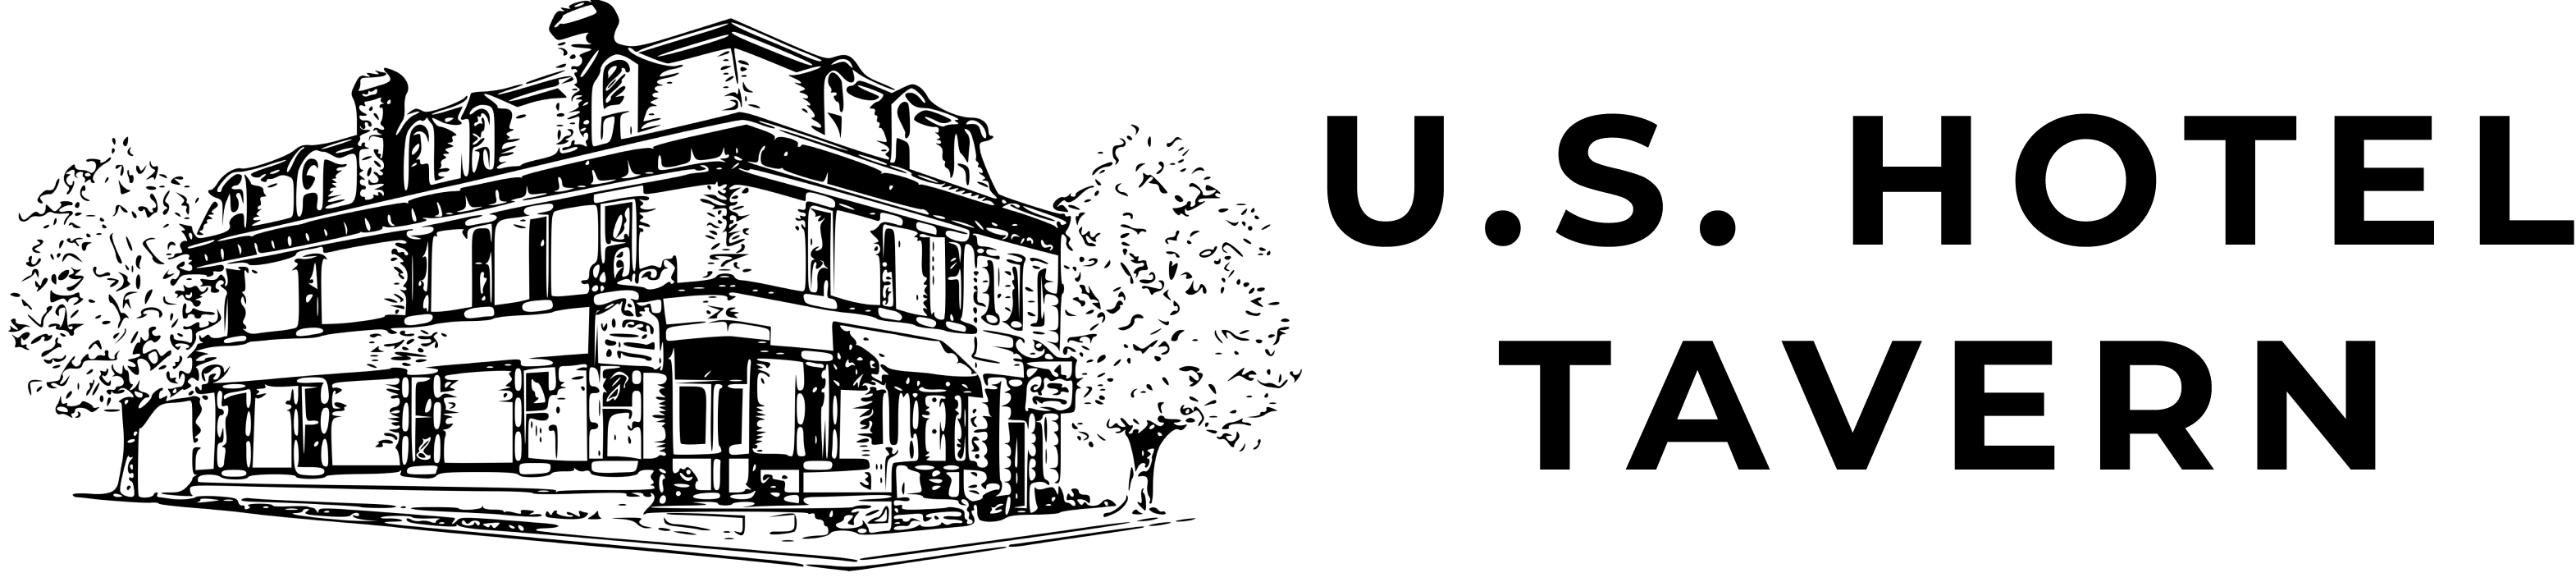 U.S. Hotel Tavern Navigation Logo